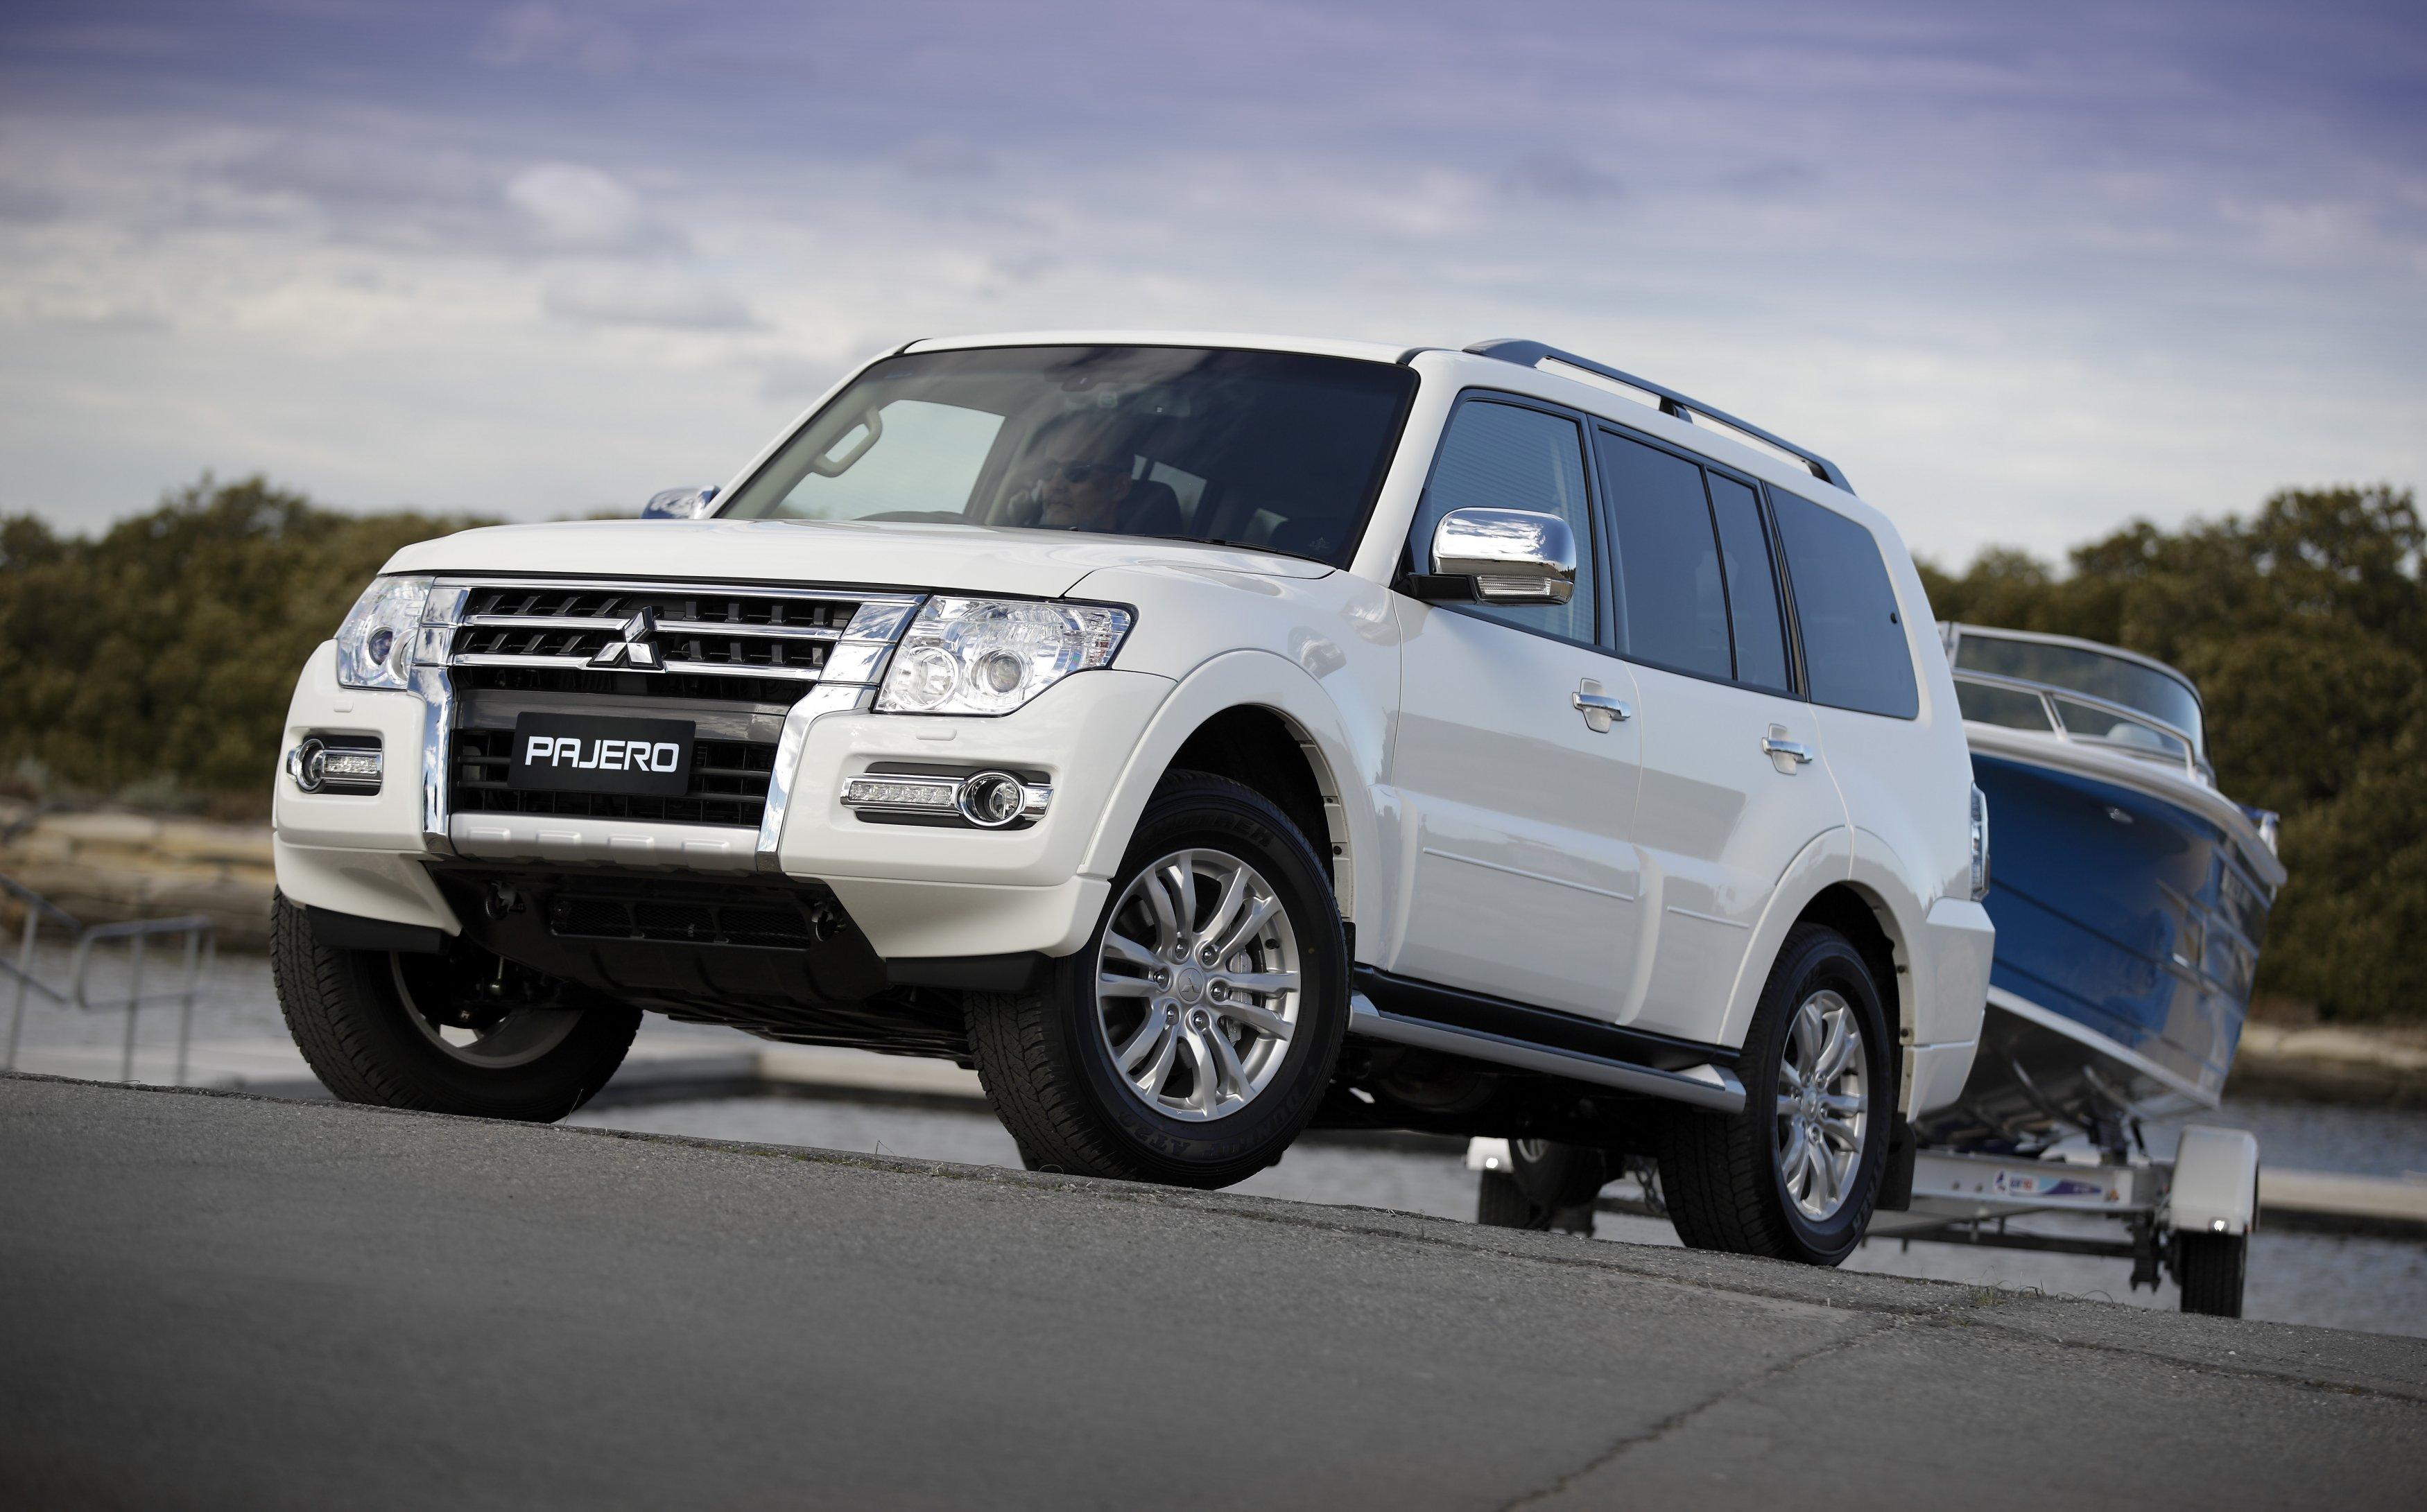 Mitsubishi Pajero production ending in 2021